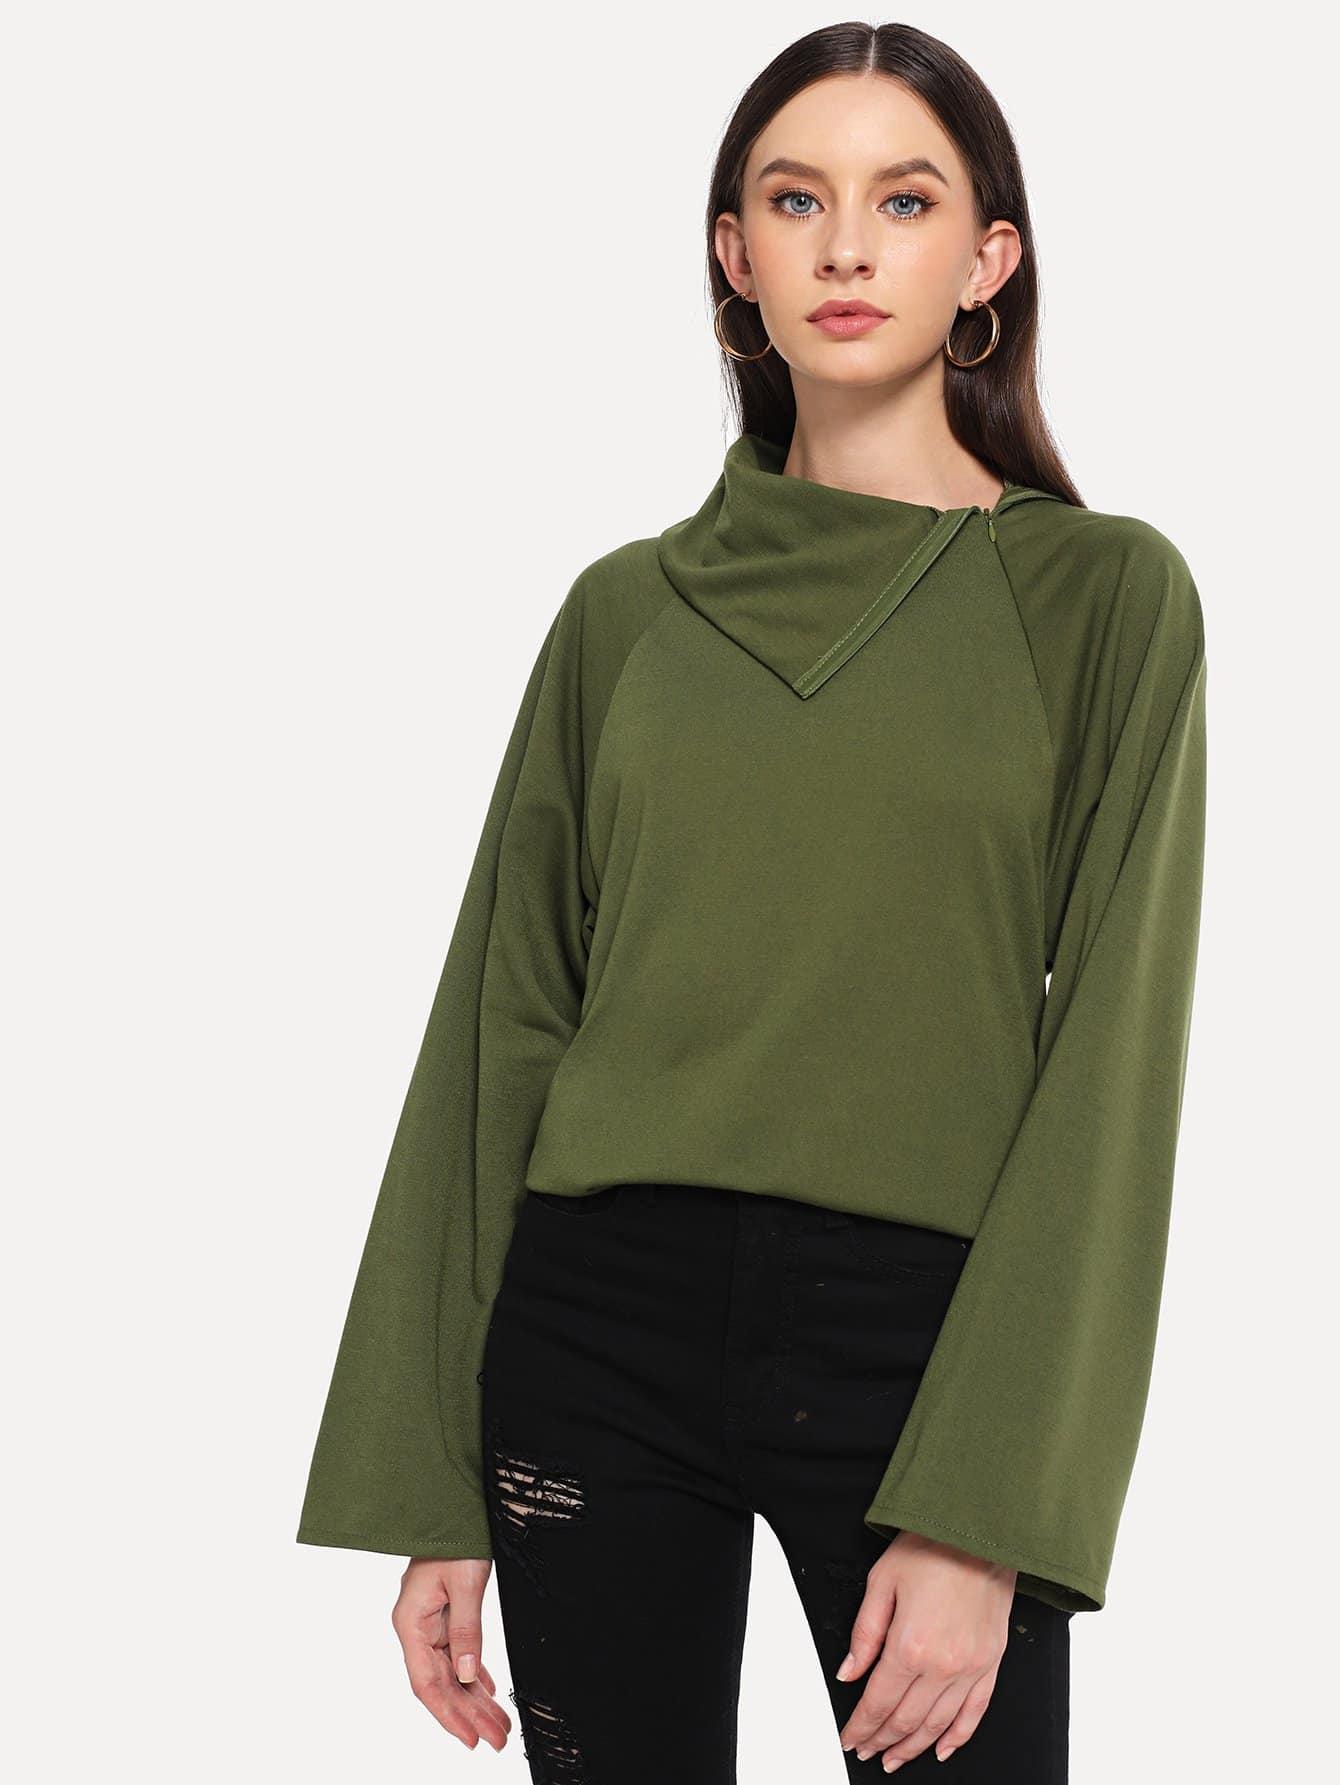 Купить Однотонная футболка с рукав-регланами, Kate B, SheIn